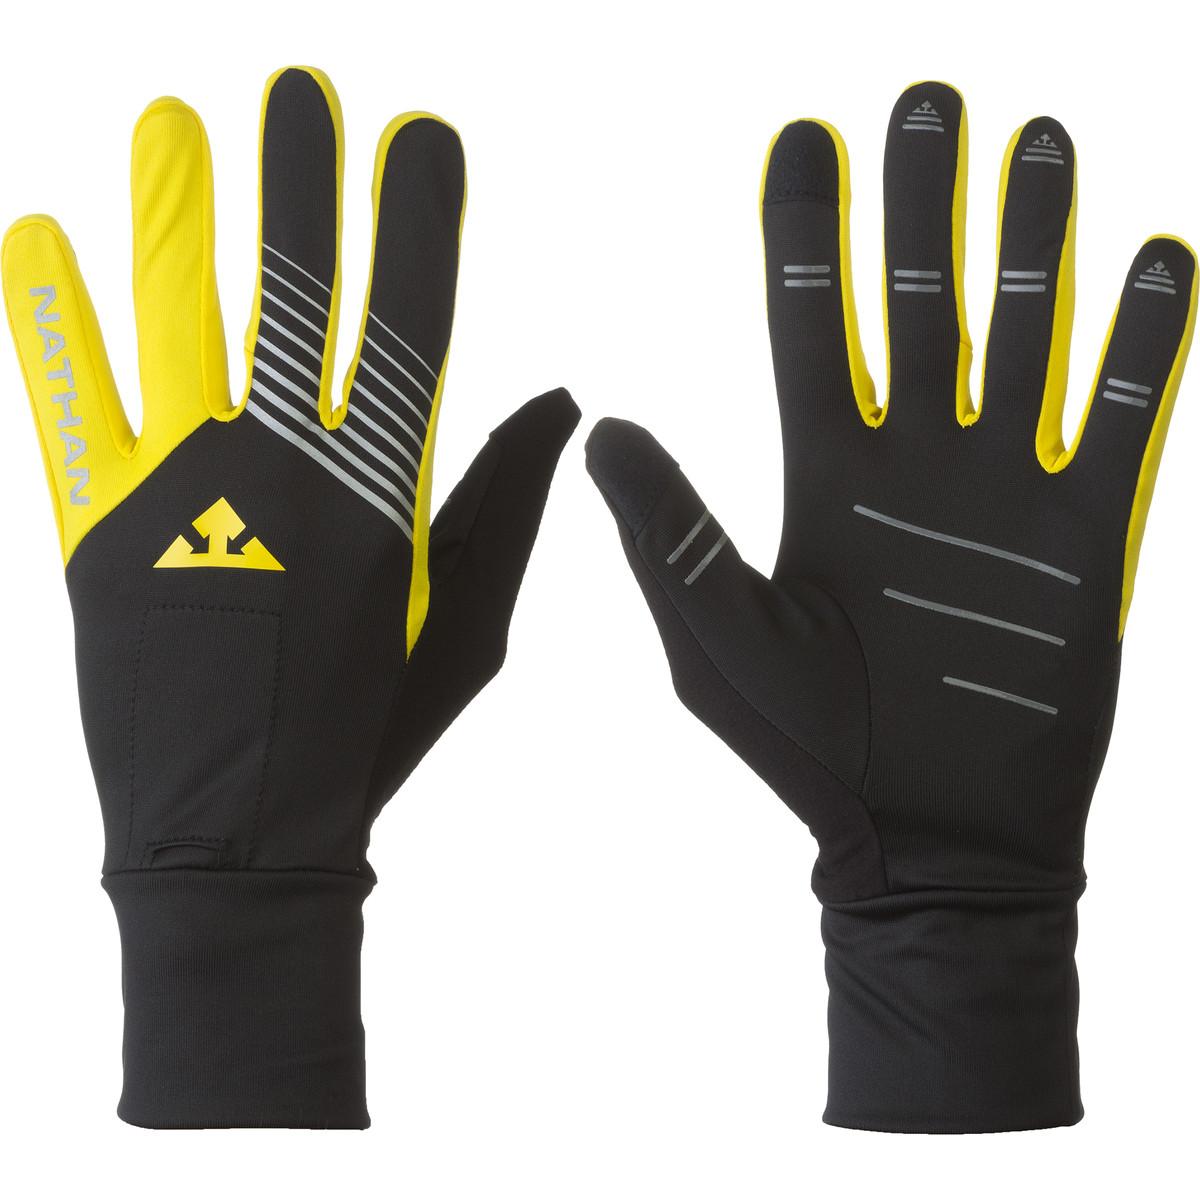 Nathan Speedster Glove